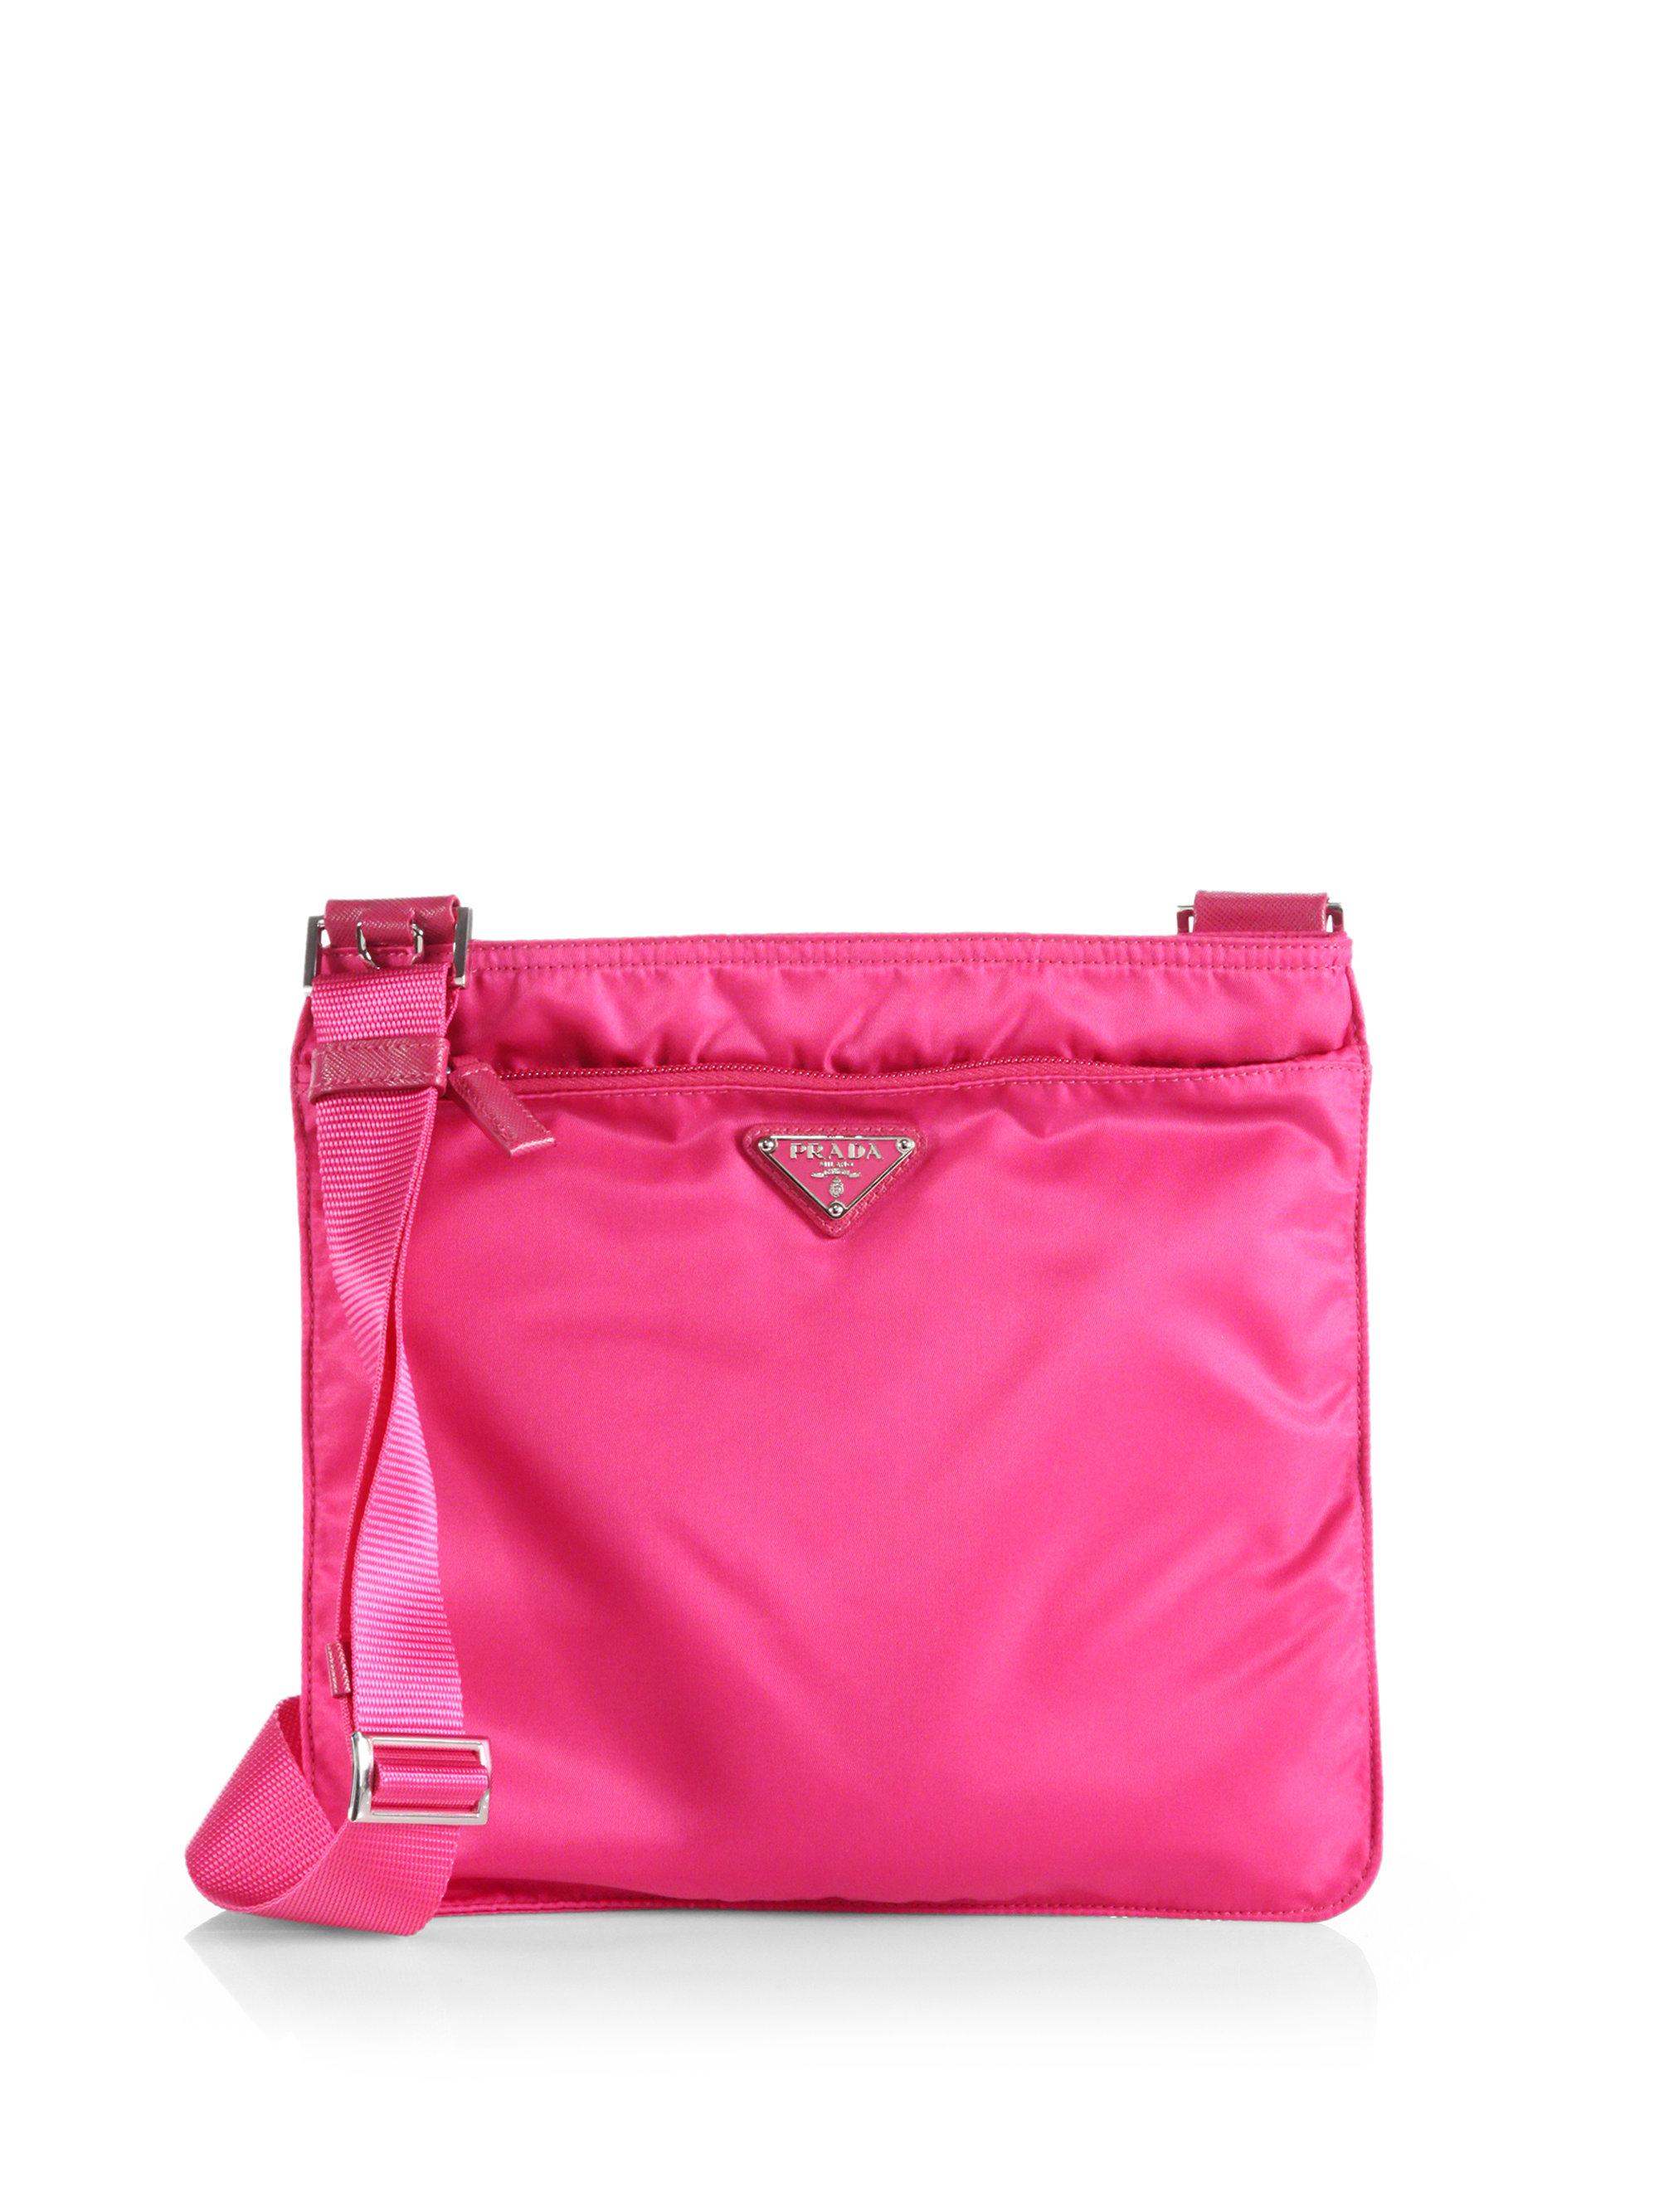 Prada Vela Crossbody Bag in Pink (FUCHSIA) | Lyst